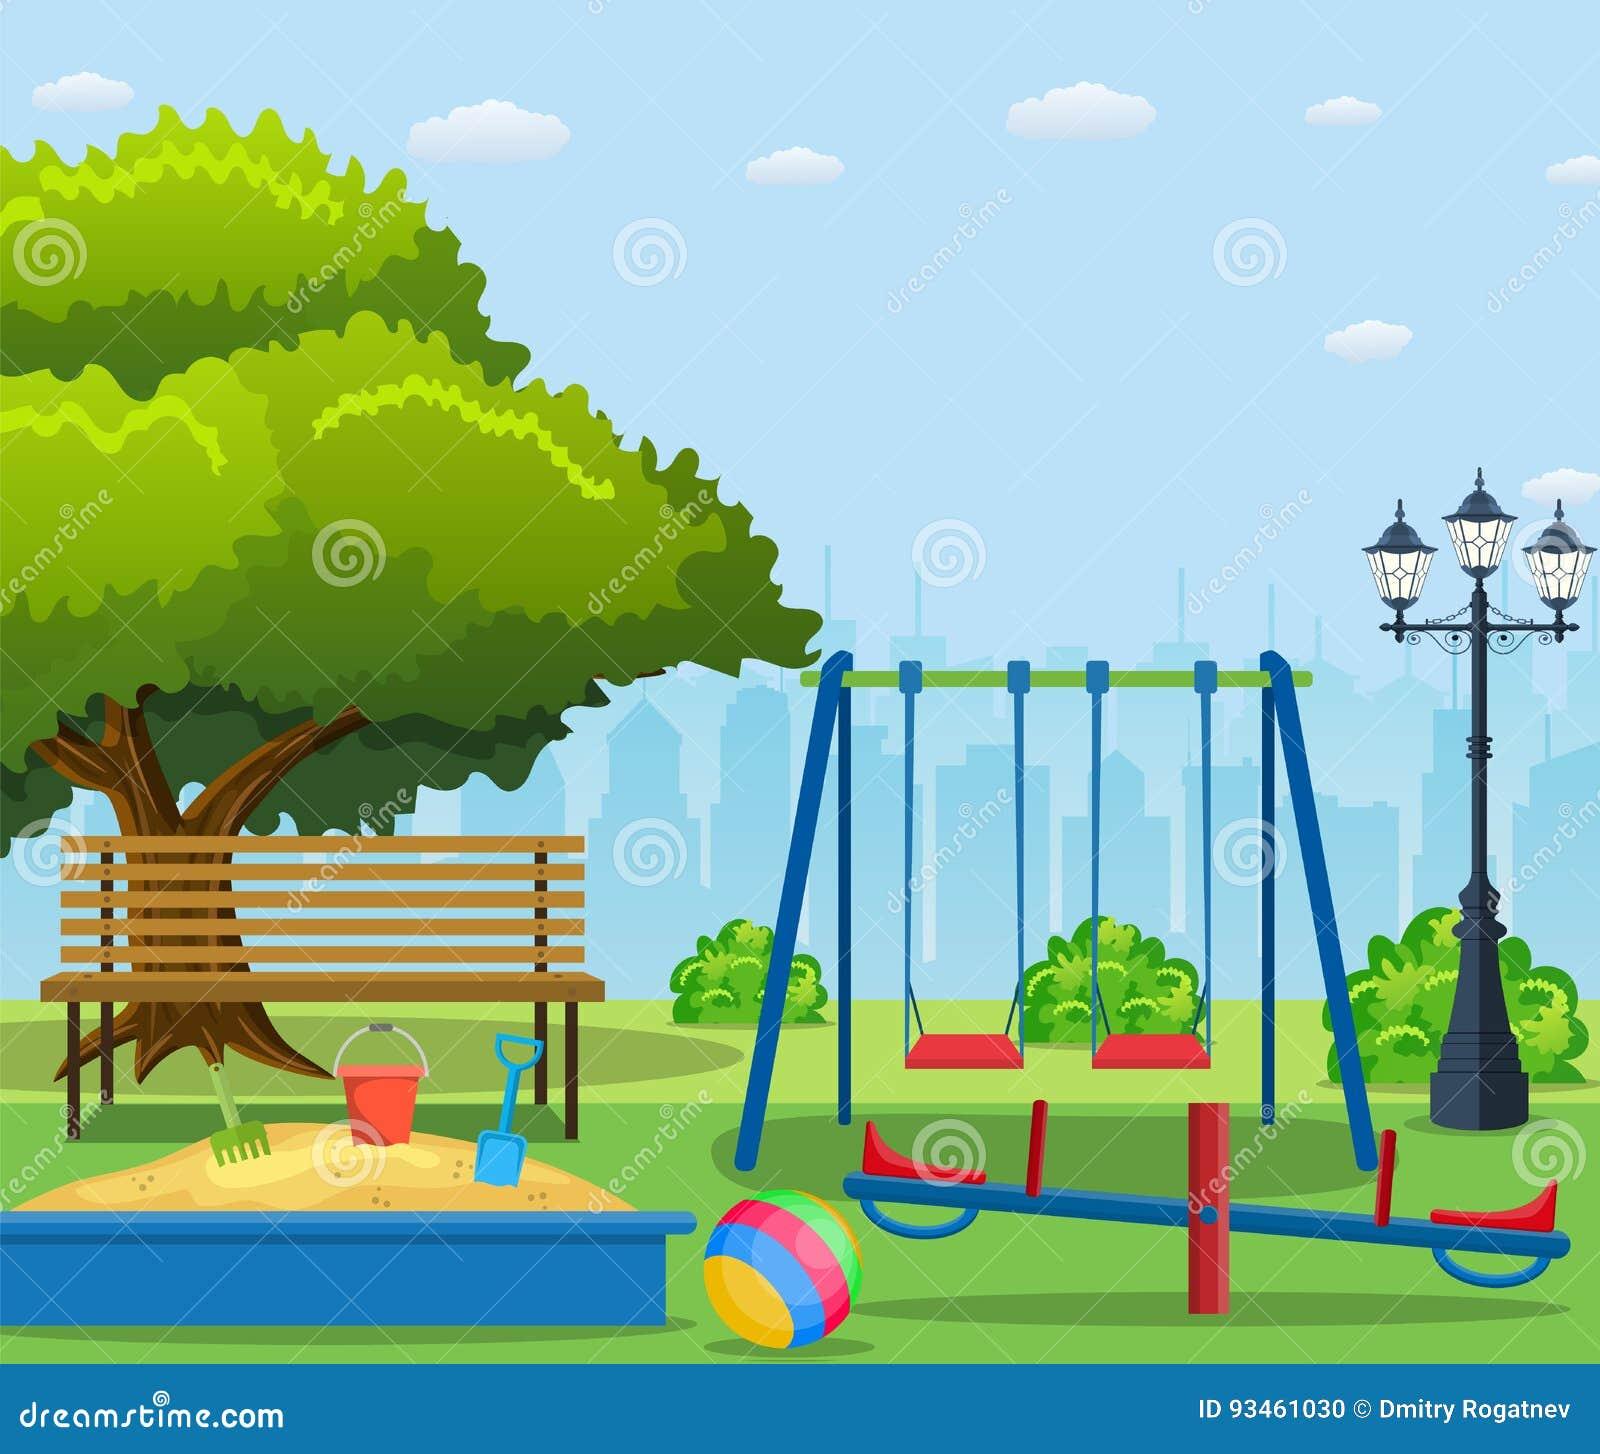 kids playground cartoon concept background cartoon vector